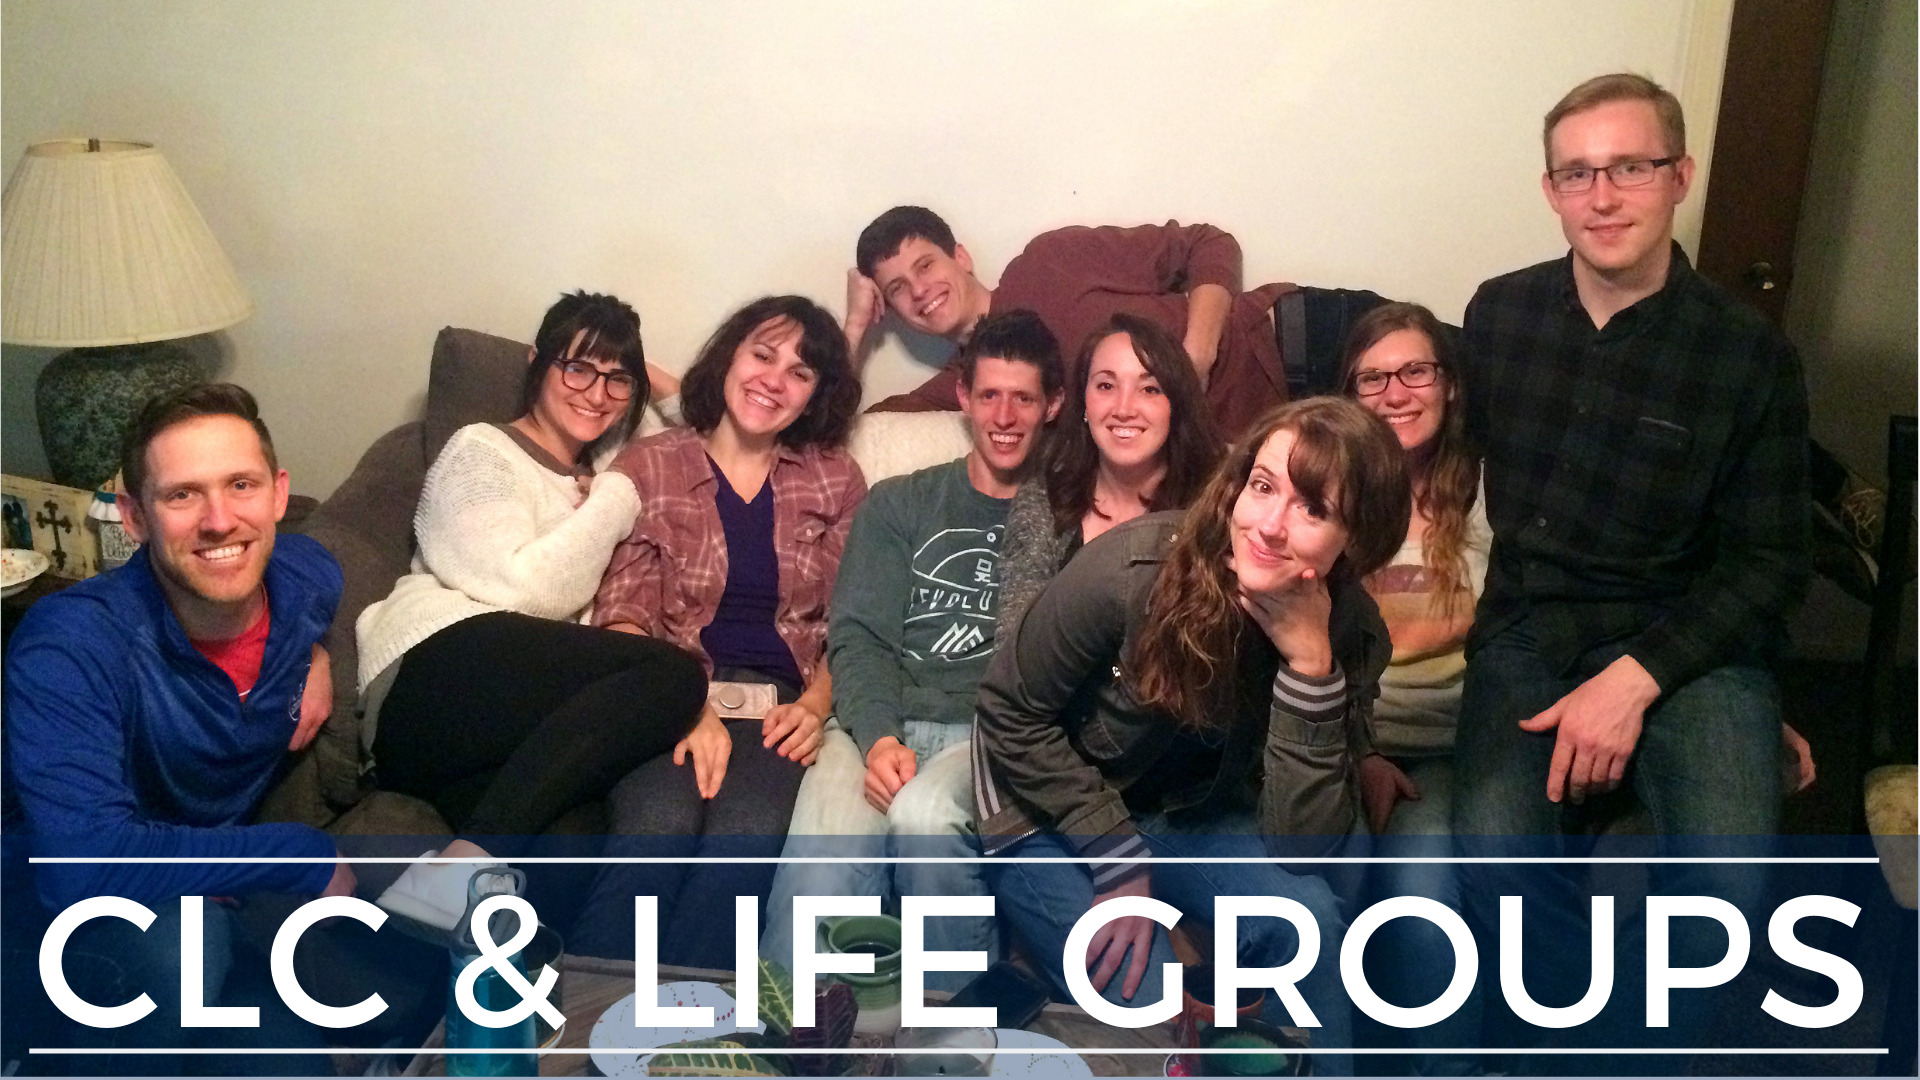 CLC & LIFE GROUPS.png